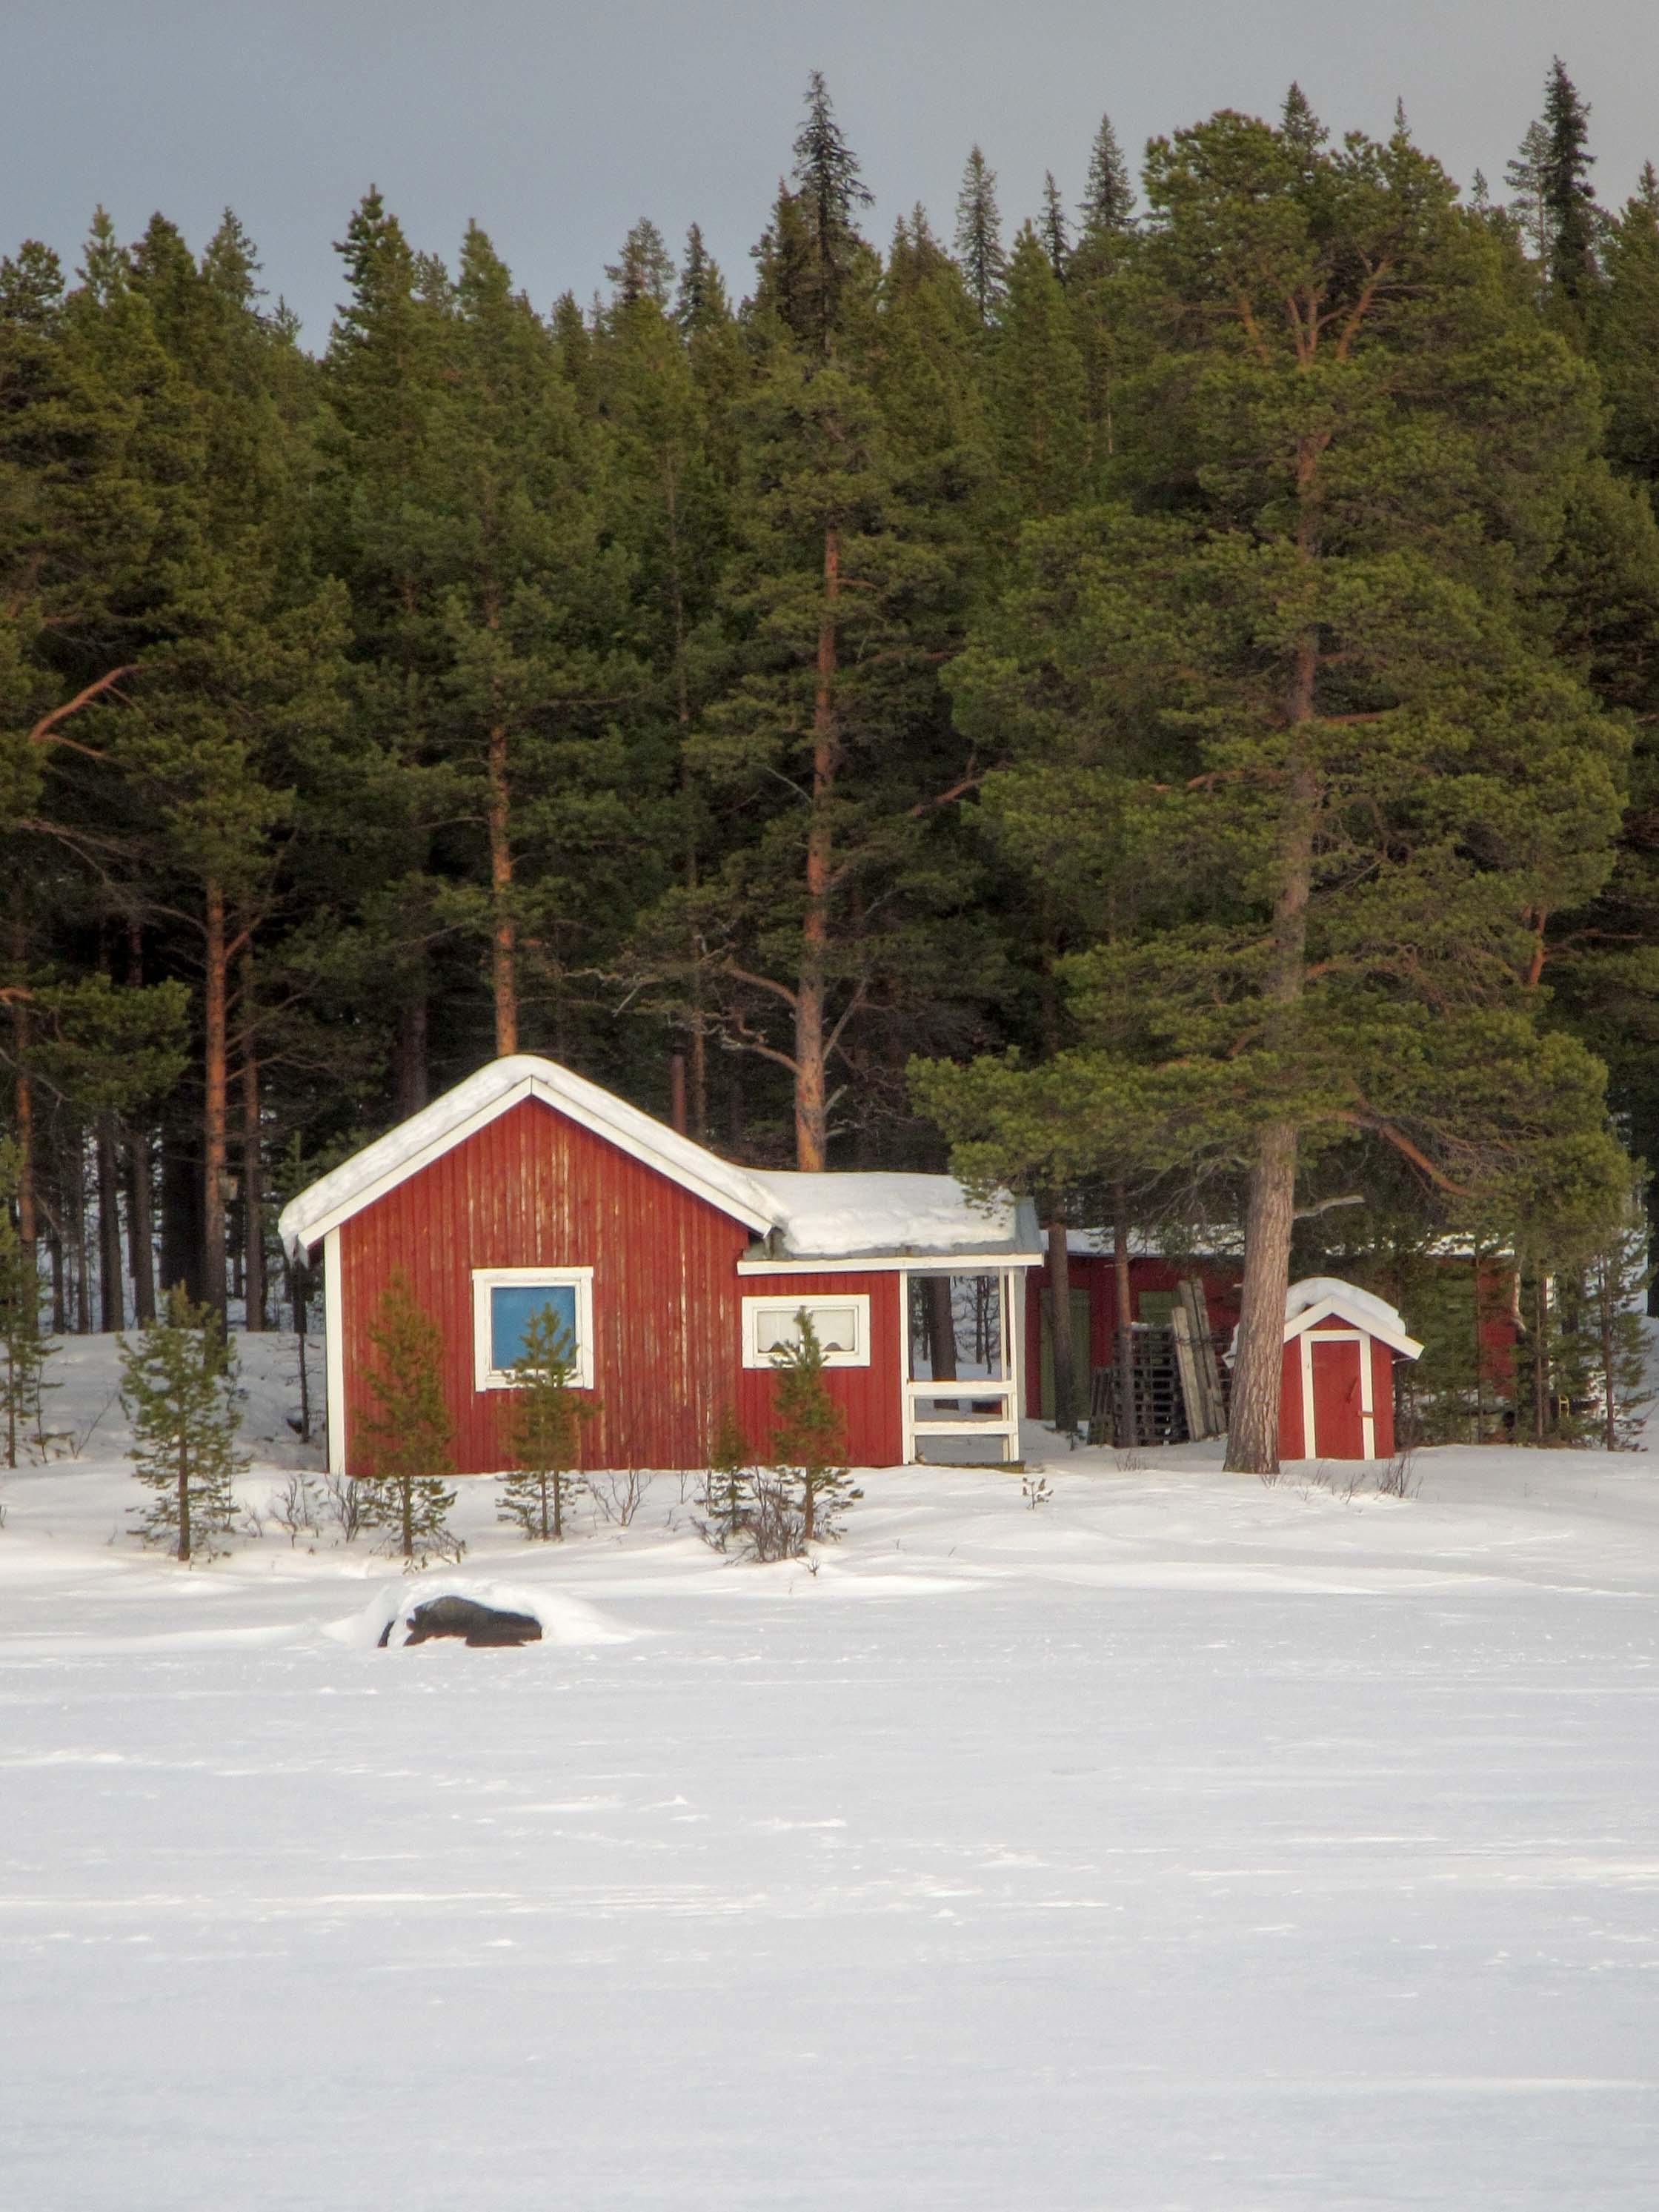 Lake house in the Swedish wilderness. I'll take one please!